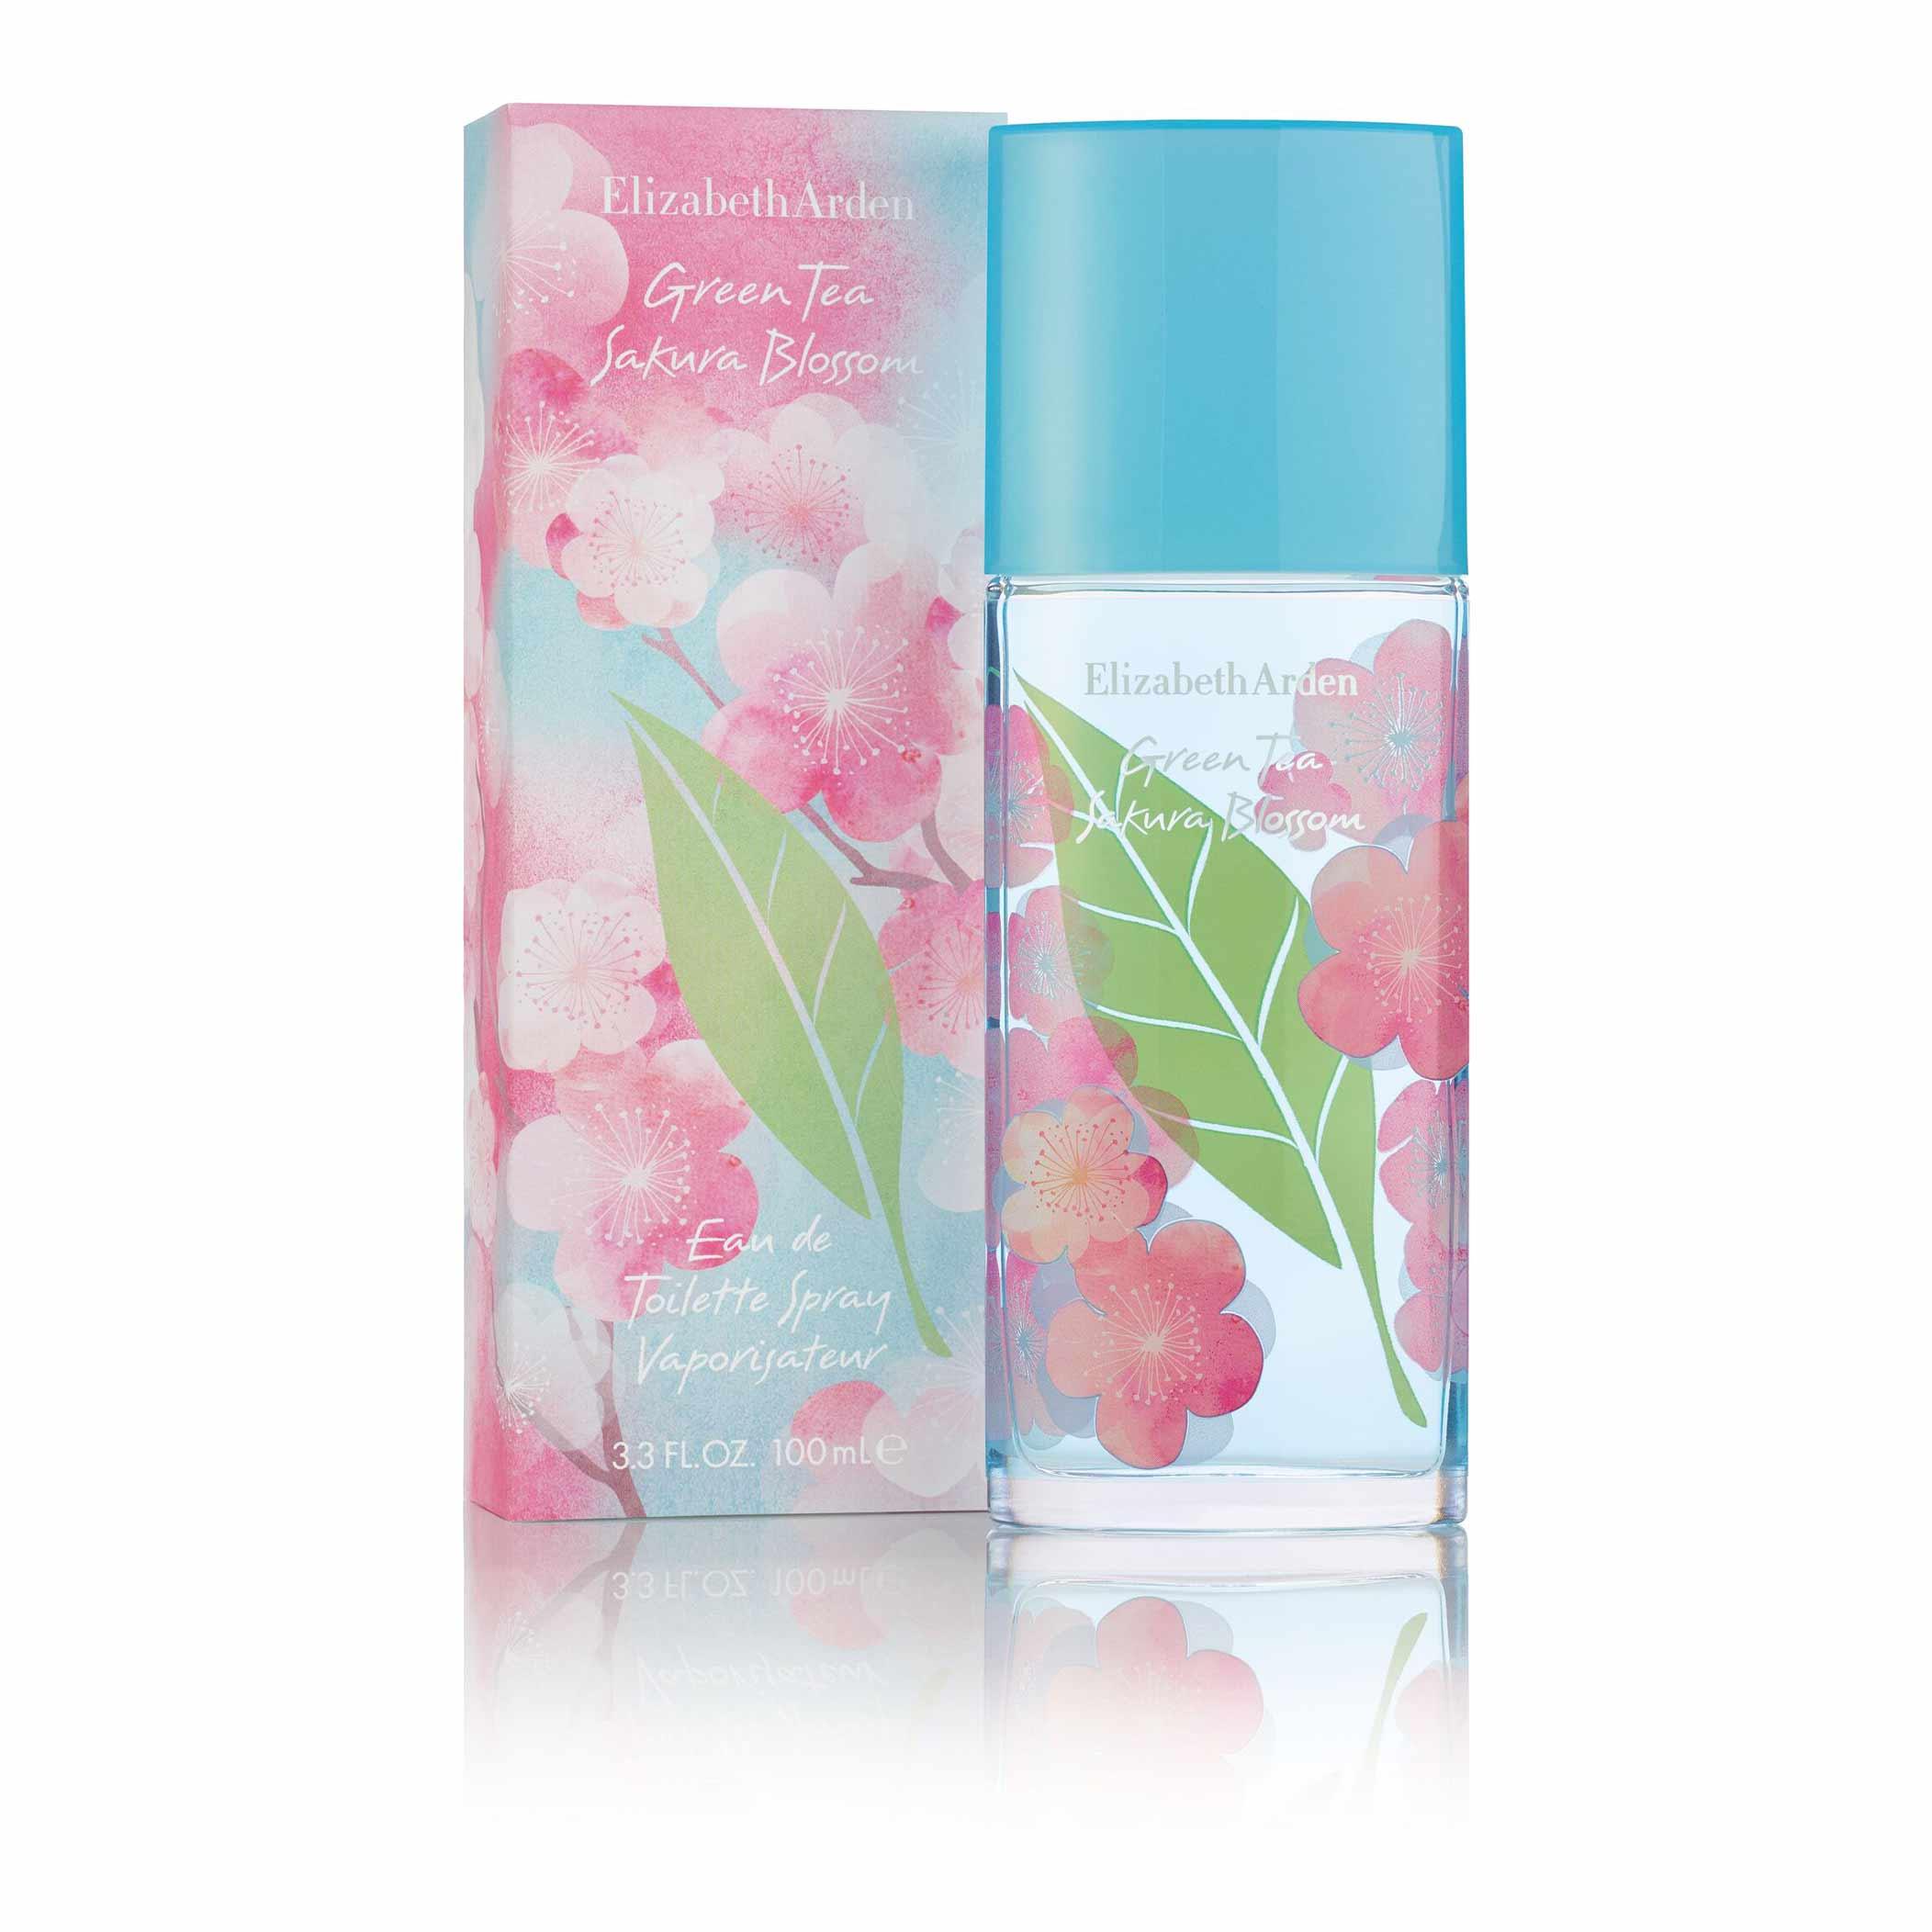 Green Tea Sakura Blossom Eau de Toilette, , large